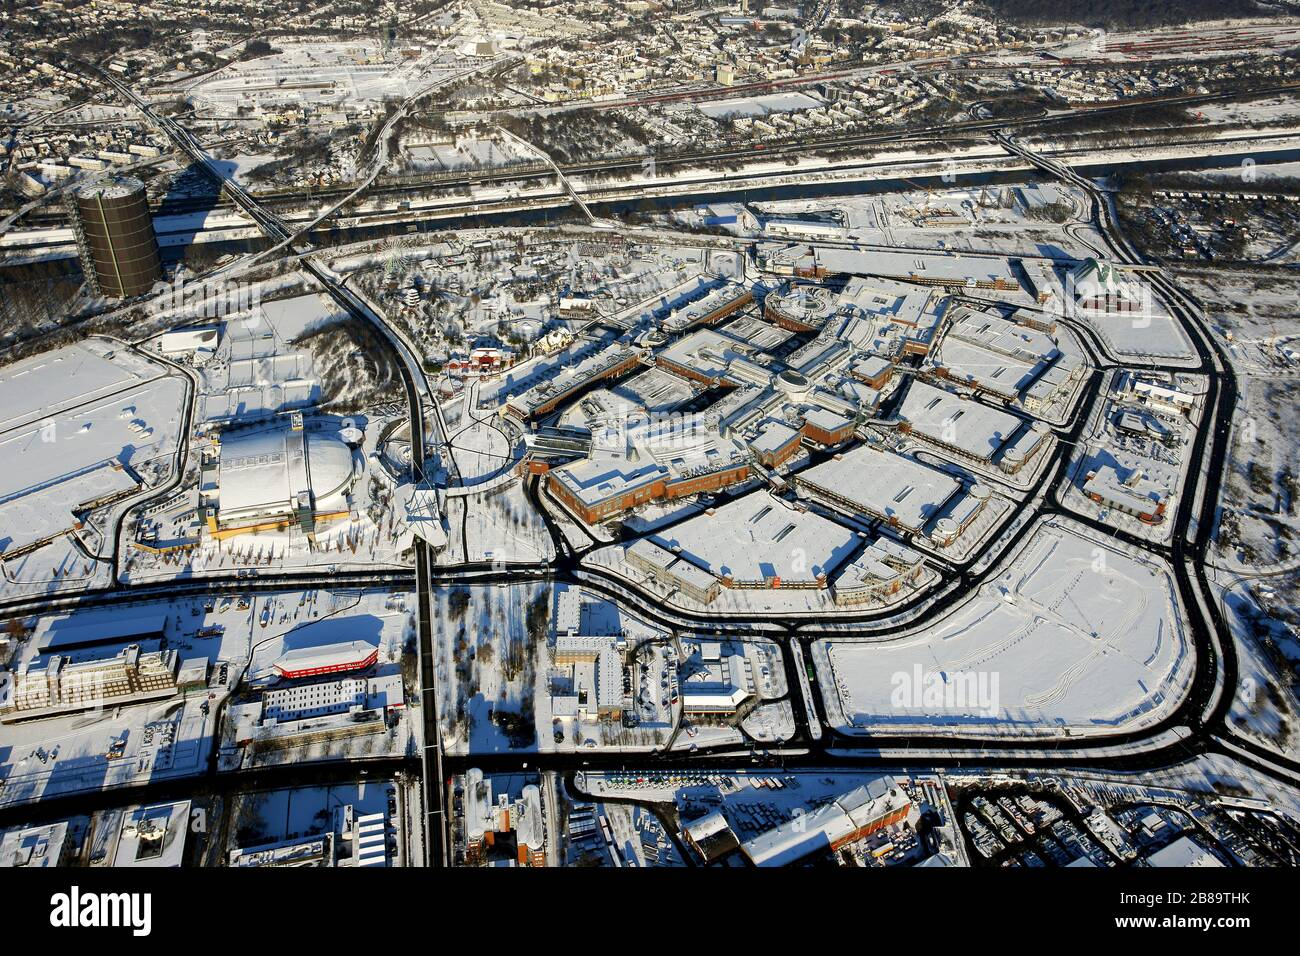 , shopping centre CentrO in Oberhausen with Gasometer Oberhausenin winter, 06.01.2009, aerial view, Germany, North Rhine-Westphalia, Ruhr Area, Oberhausen Stock Photo